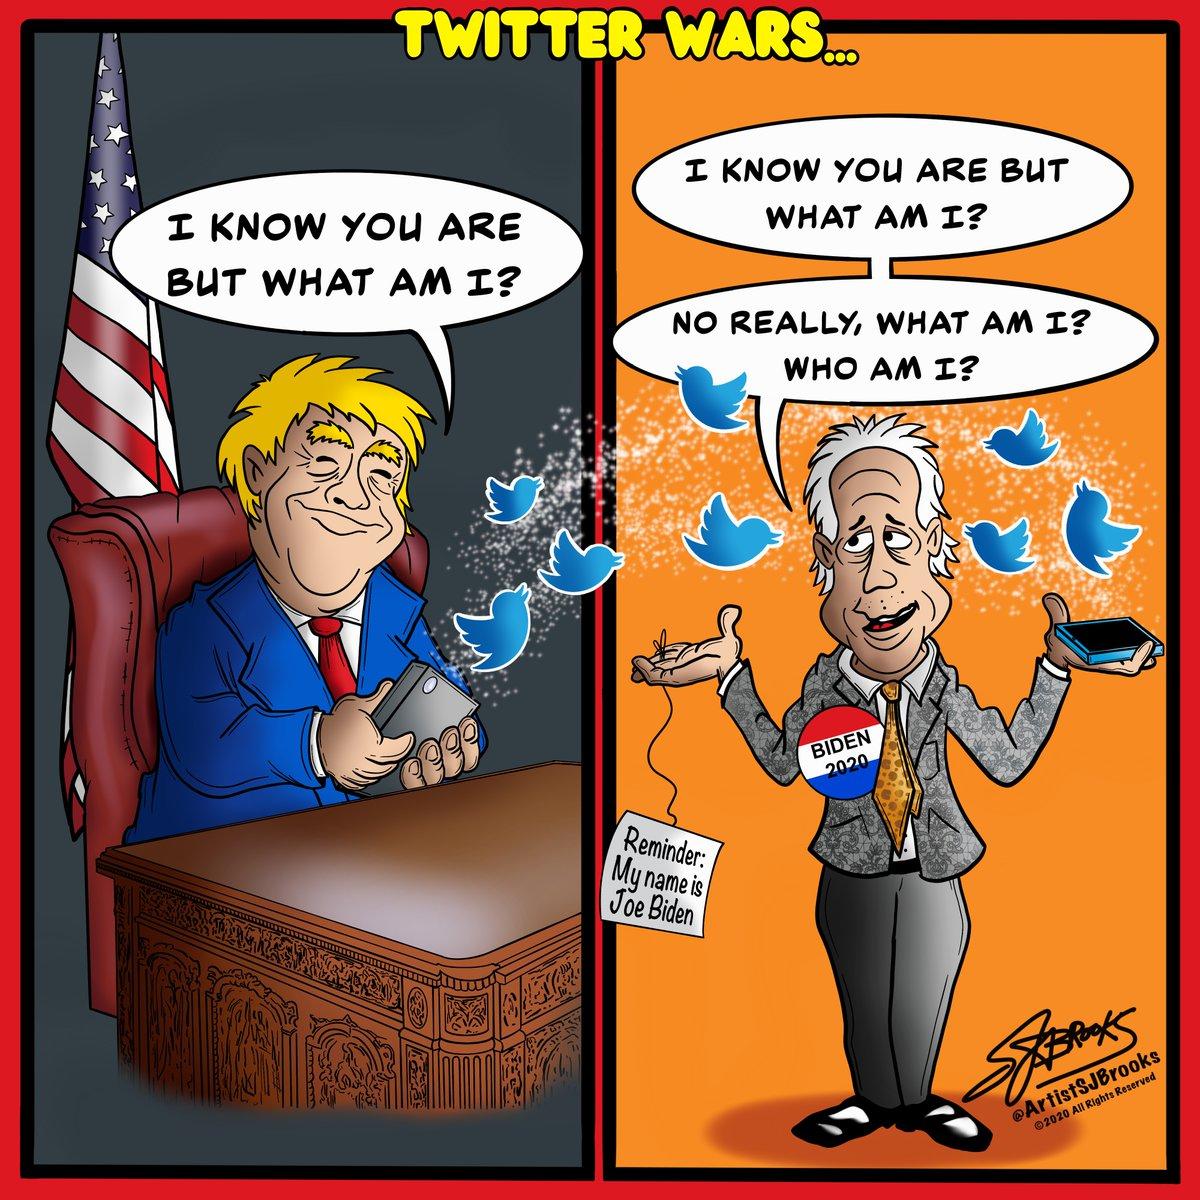 I support our president! @realDonaldTrump @WhiteHouse @TeamTrump @JoeBiden @limbaugh @DonaldJTrumpJr @NAPOpolice @NatPoliceAssoc @RealCandaceO  @charliekirk11 @roguereviewHQ @FoxNews @babe4trump @Chick4Trump @PulitzerPrizes @NRA #twitter #debate #democraticdebate #rushlimbaughpic.twitter.com/evg3gu8yXq